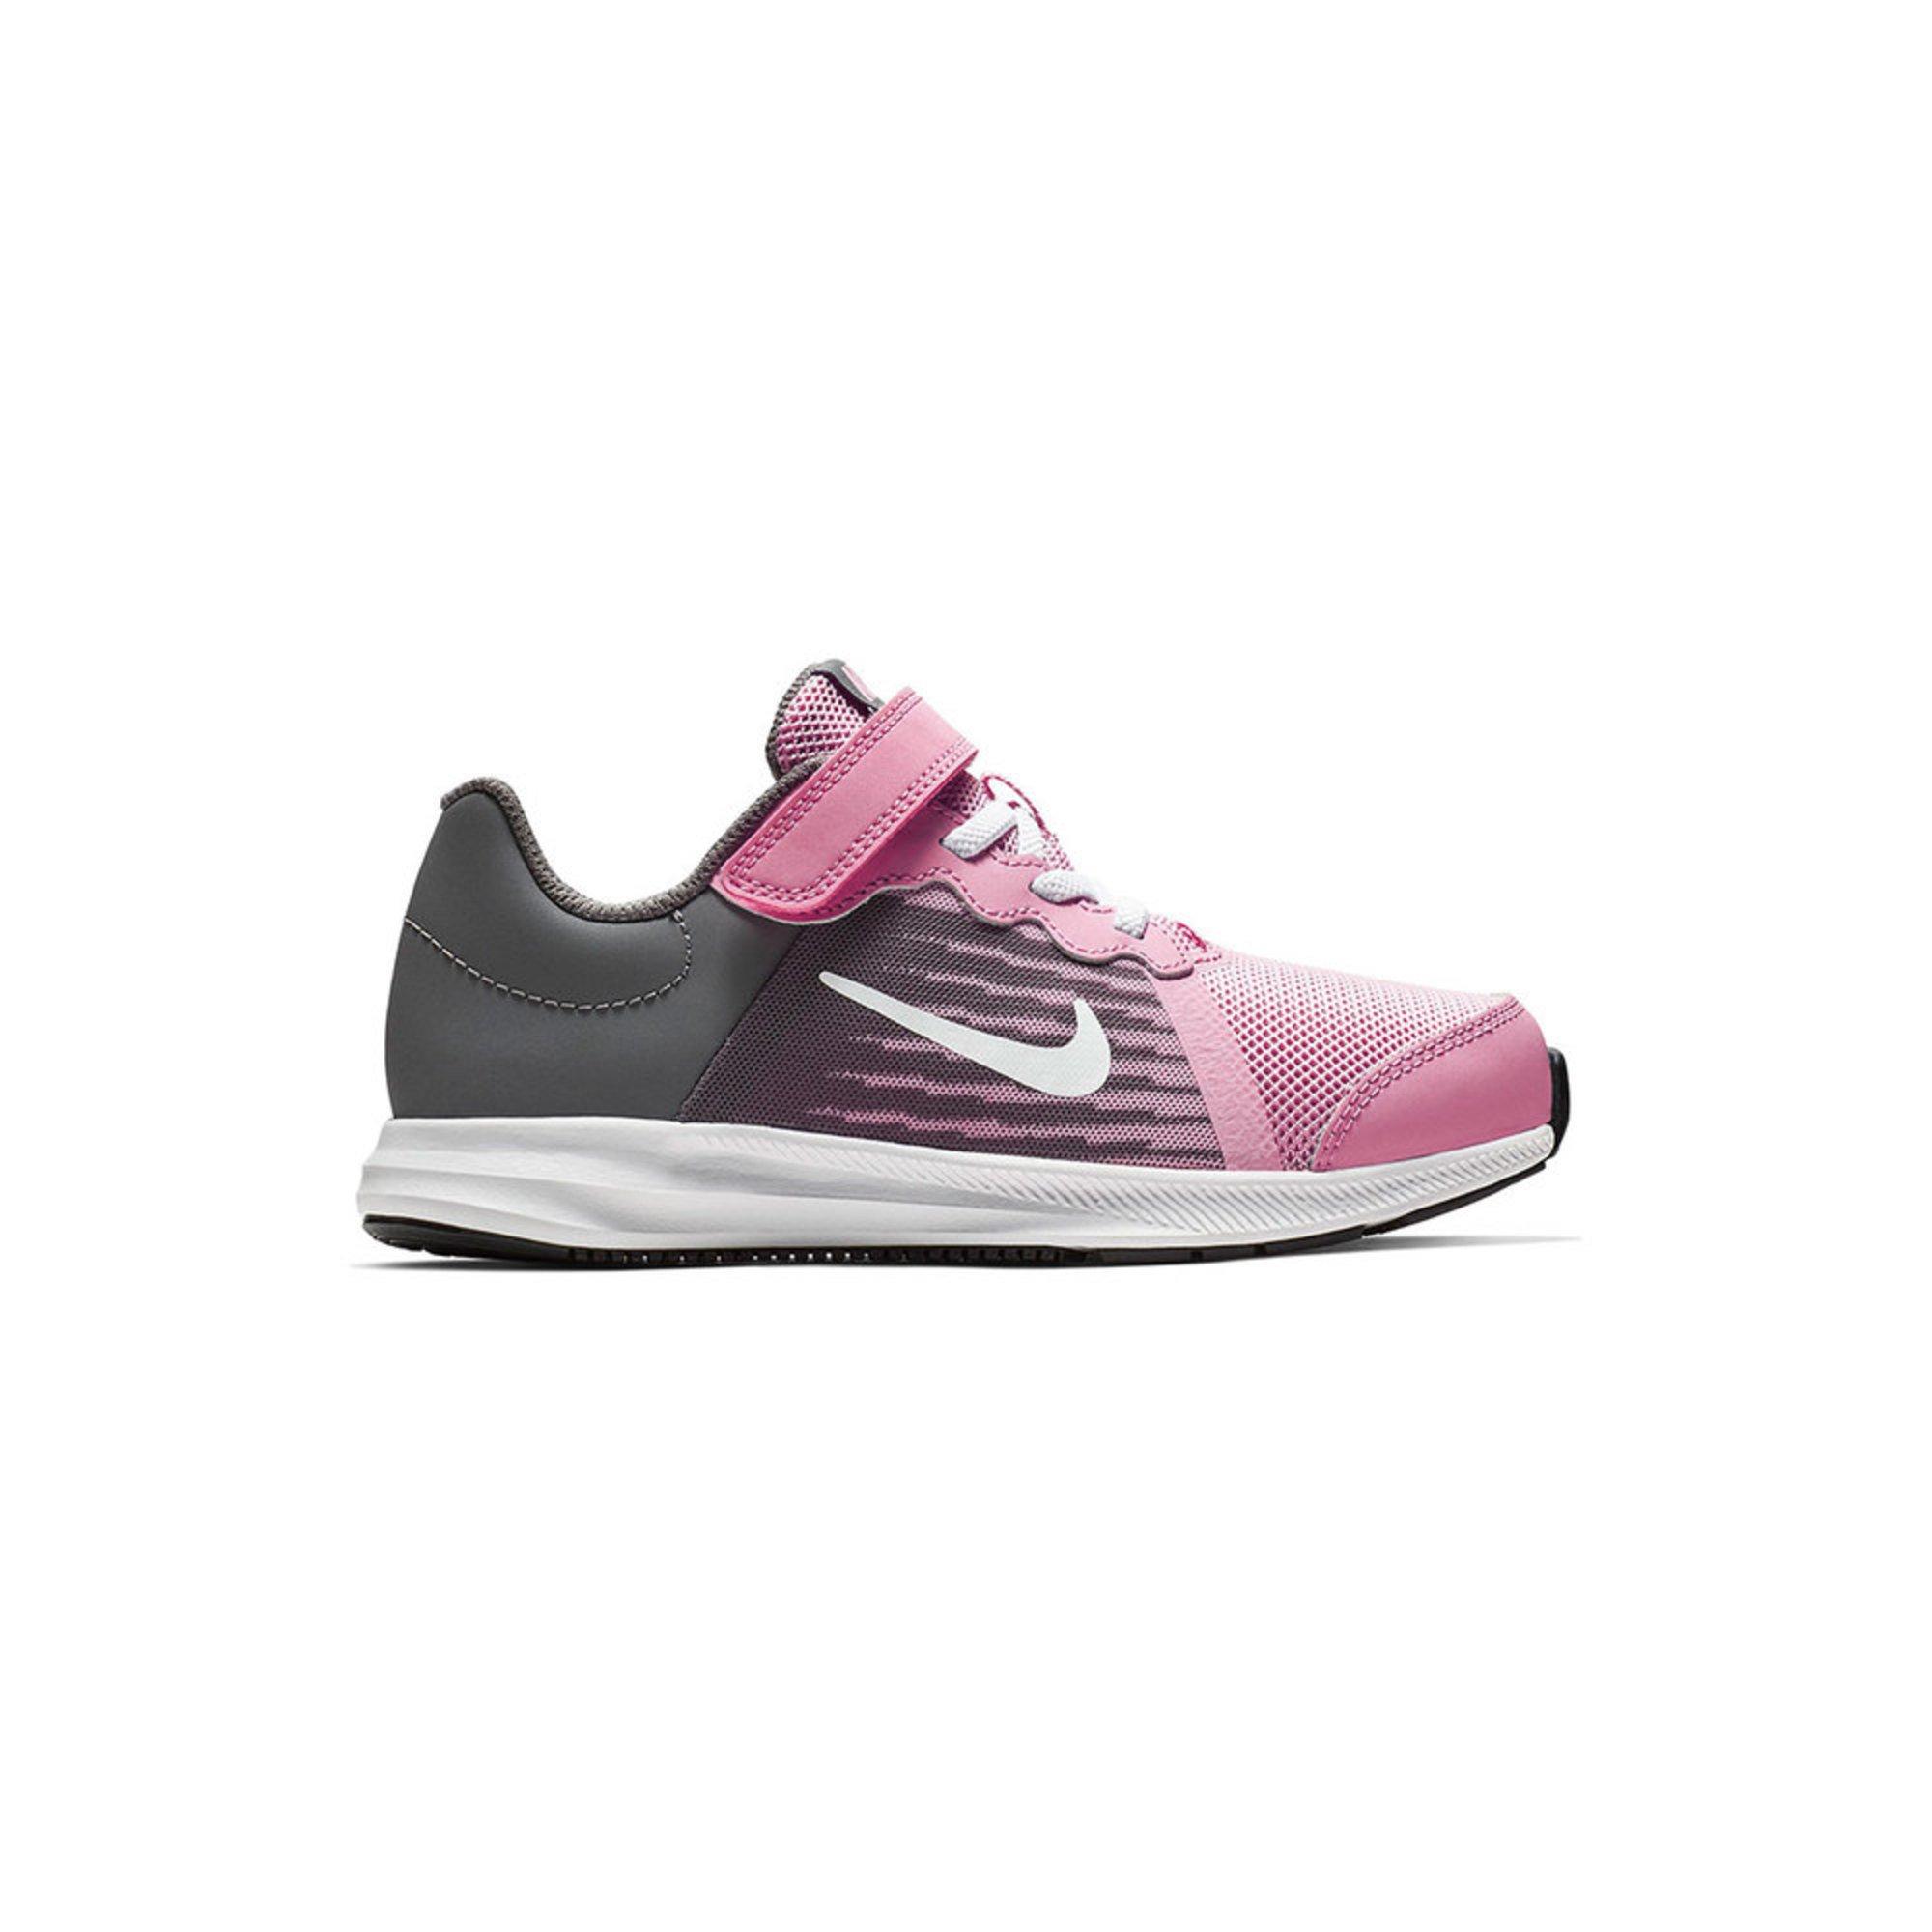 2a312e0028 Nike Girls Downshifter 8 Running Shoe (little Kid) | Little Kid ...